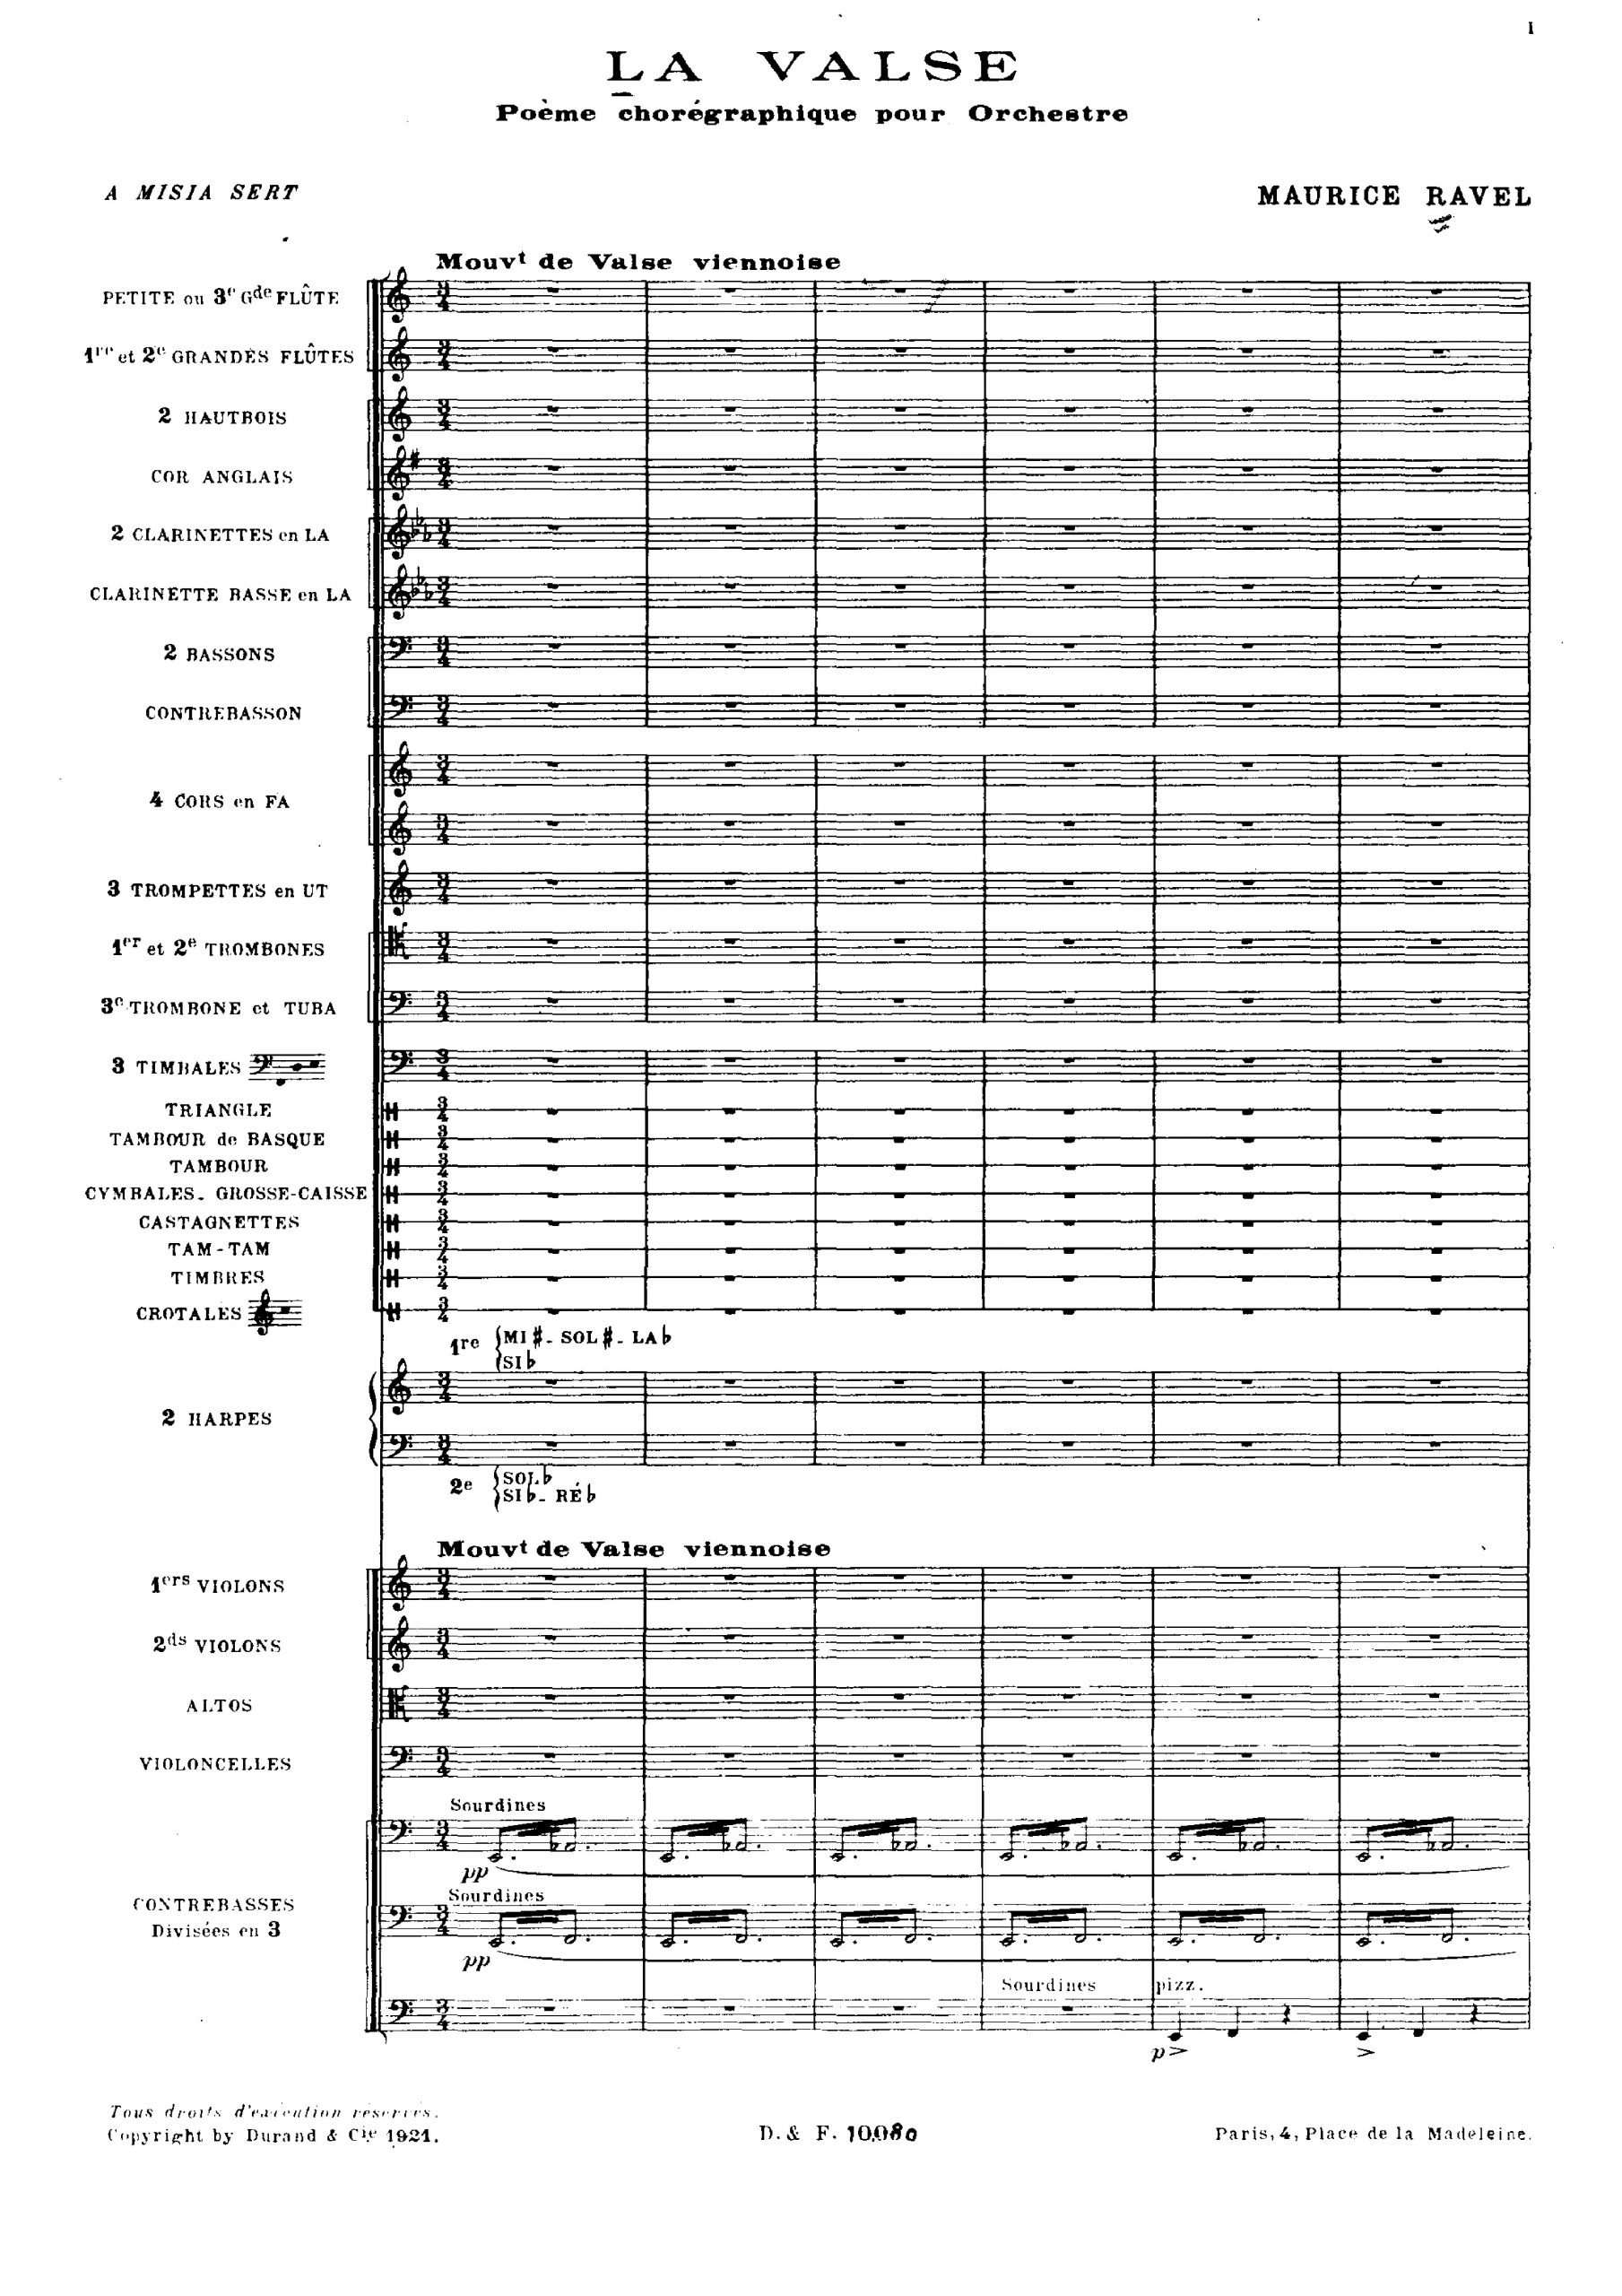 Ravel, Maurice - La valse score